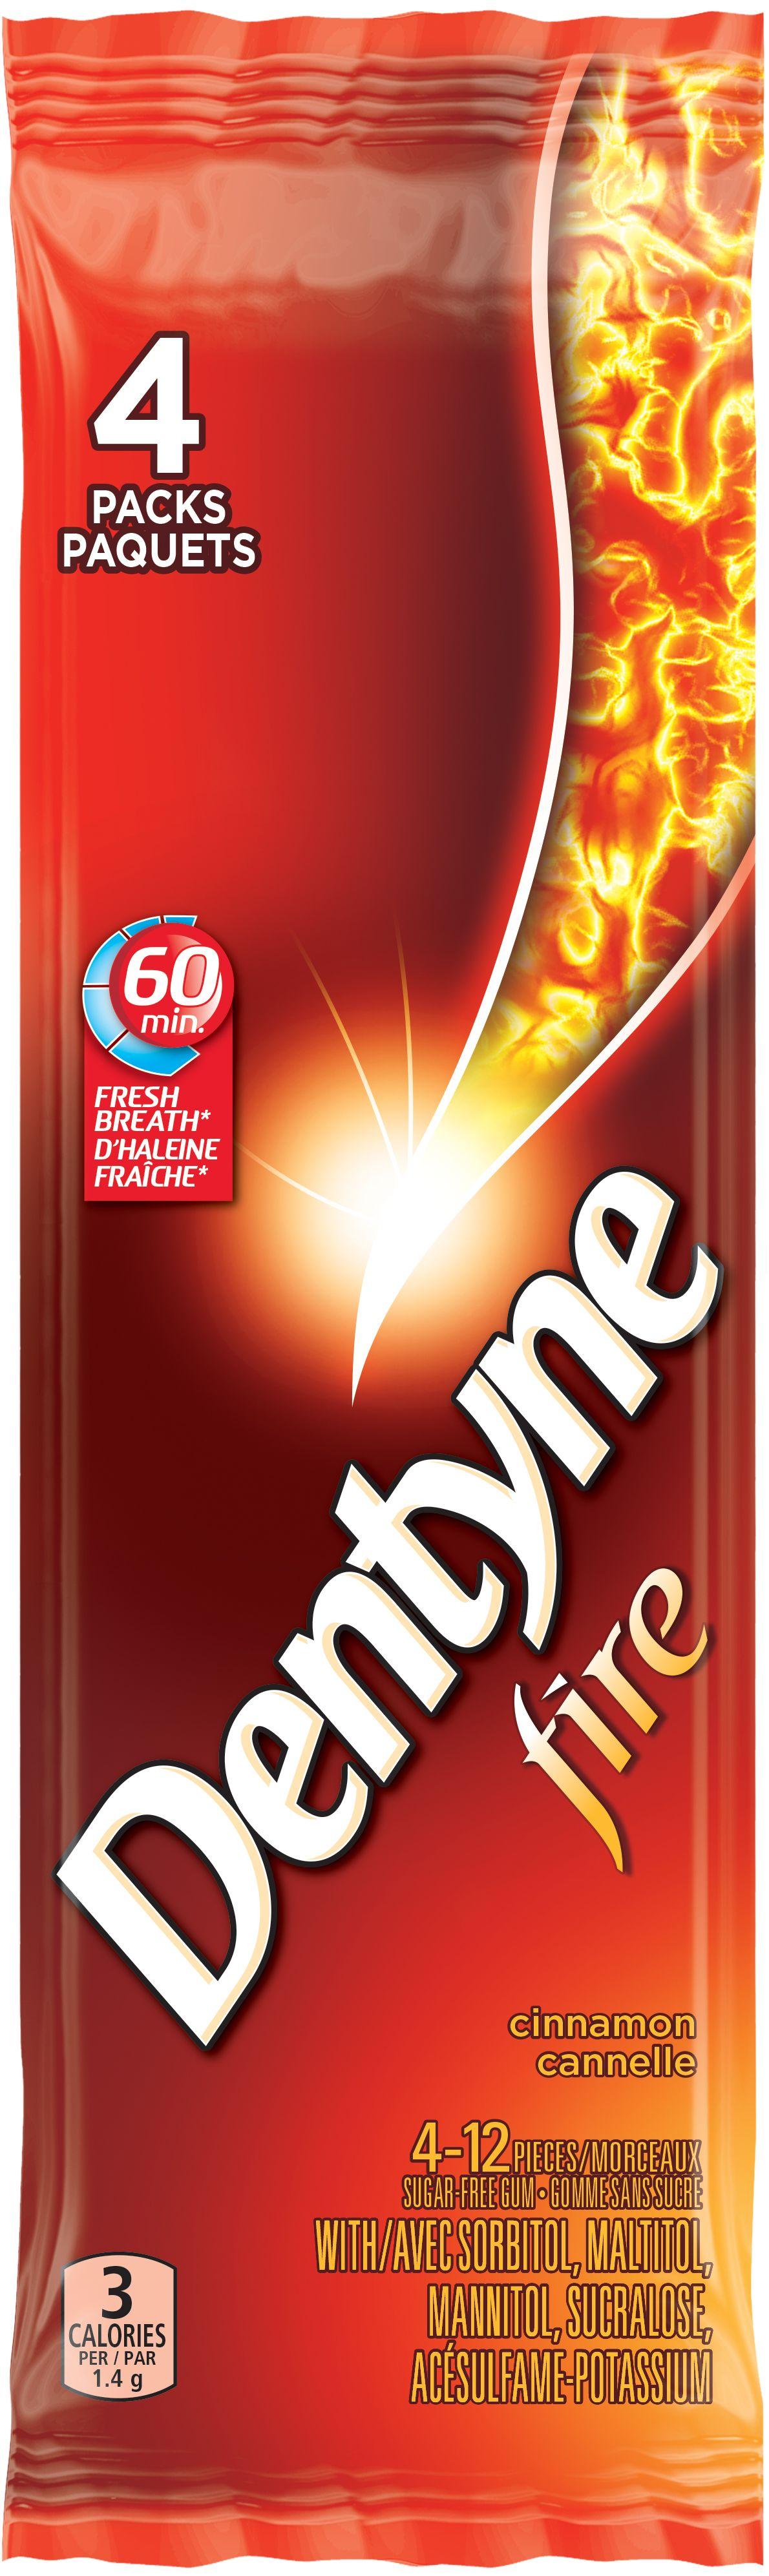 Dentyne Fire Cinnamon Gum 48 Count